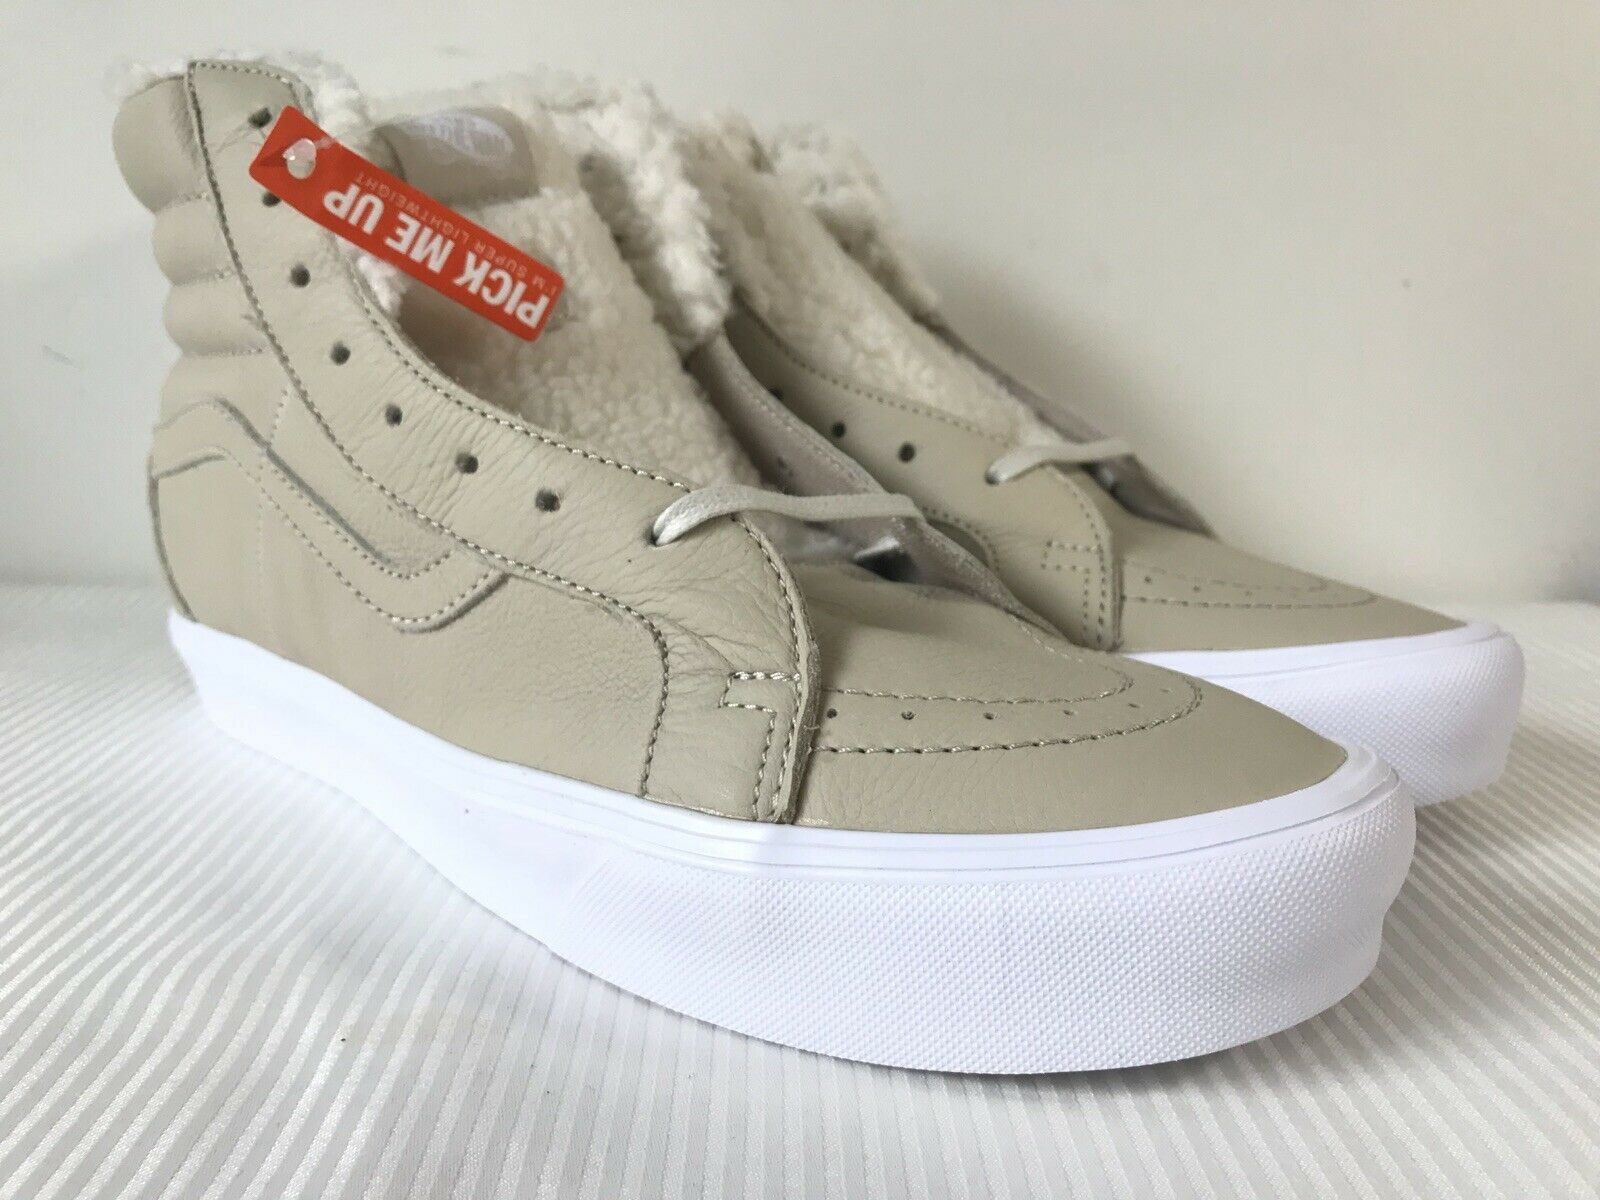 Vans SK8-Hi Reissue Lite Sherpa Cement Sneakers VN0A38GKQXC NWOB DS Men's Sz 13